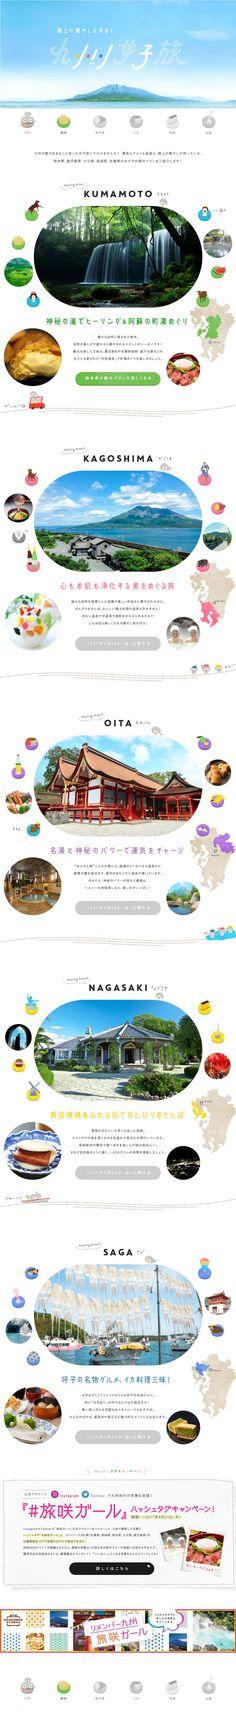 Website Design Layout, Layout Design, Web Design Gallery, Zentangle, Best Web Design, Typographic Design, Communication Design, Website Design Inspiration, Japanese Design